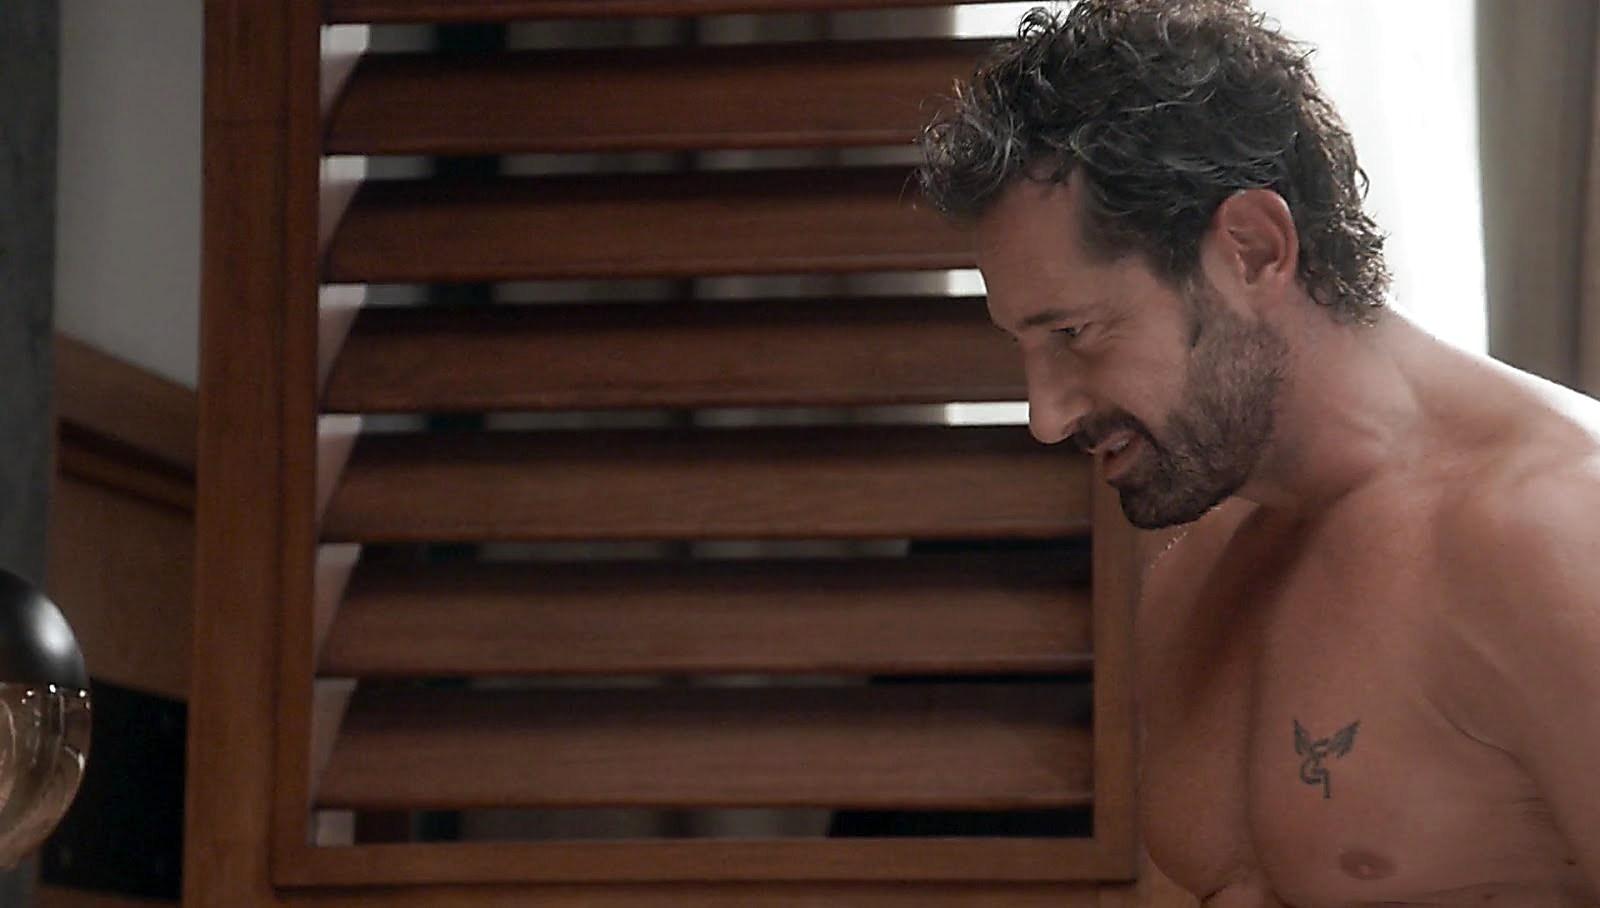 Carlos Ferro sexy shirtless scene October 21, 2017, 1pm